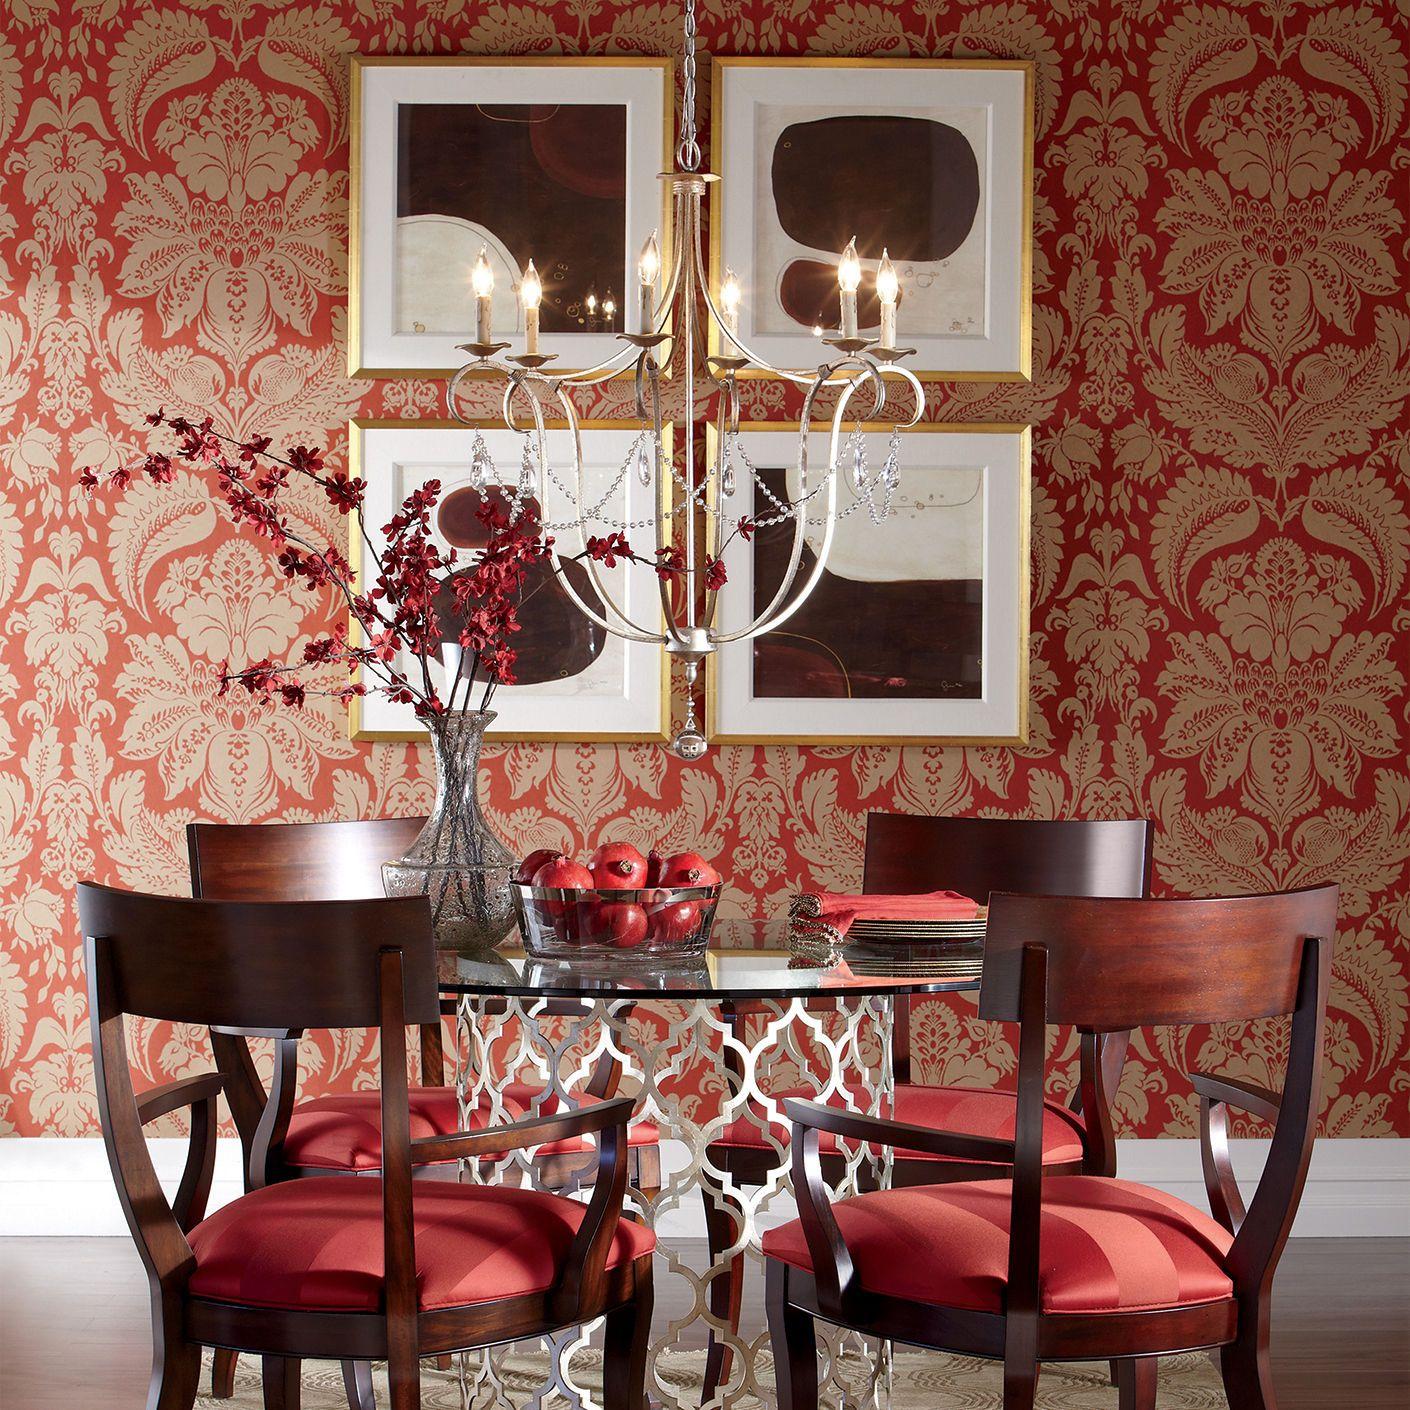 Ethan Allen Red Dining Room. Klismos Armchair